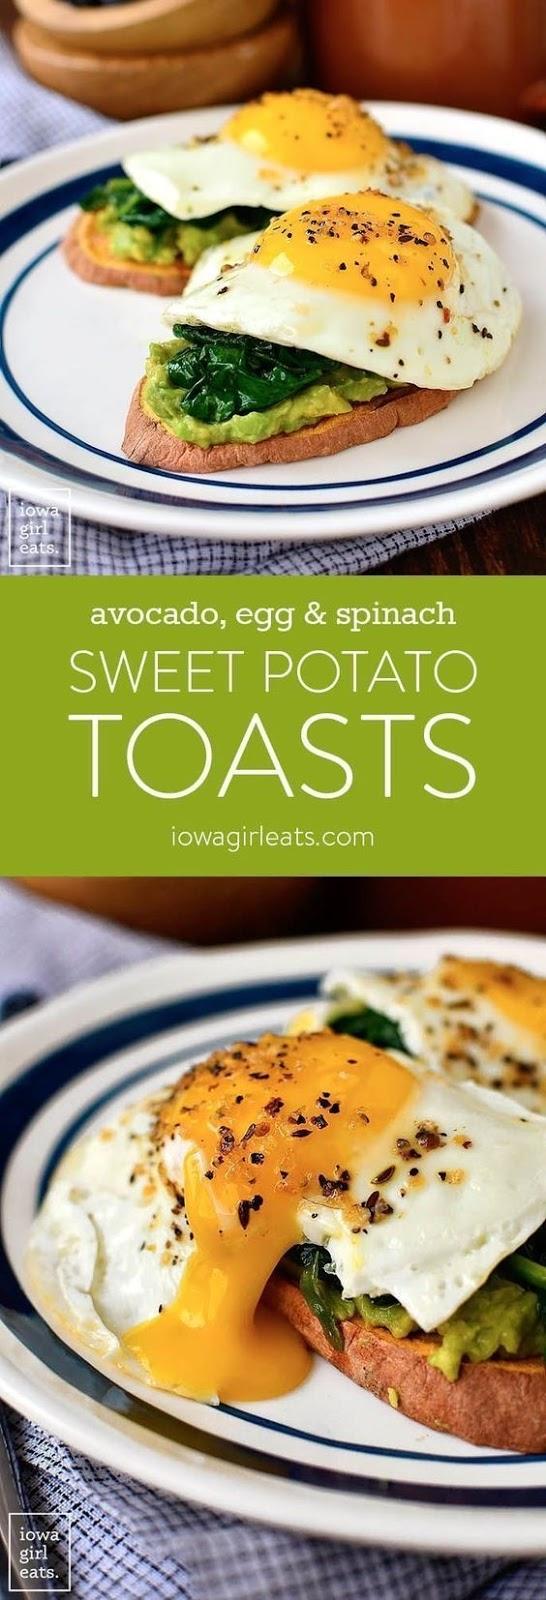 Avocado, Egg And Spinach Sweet Potato Toasts